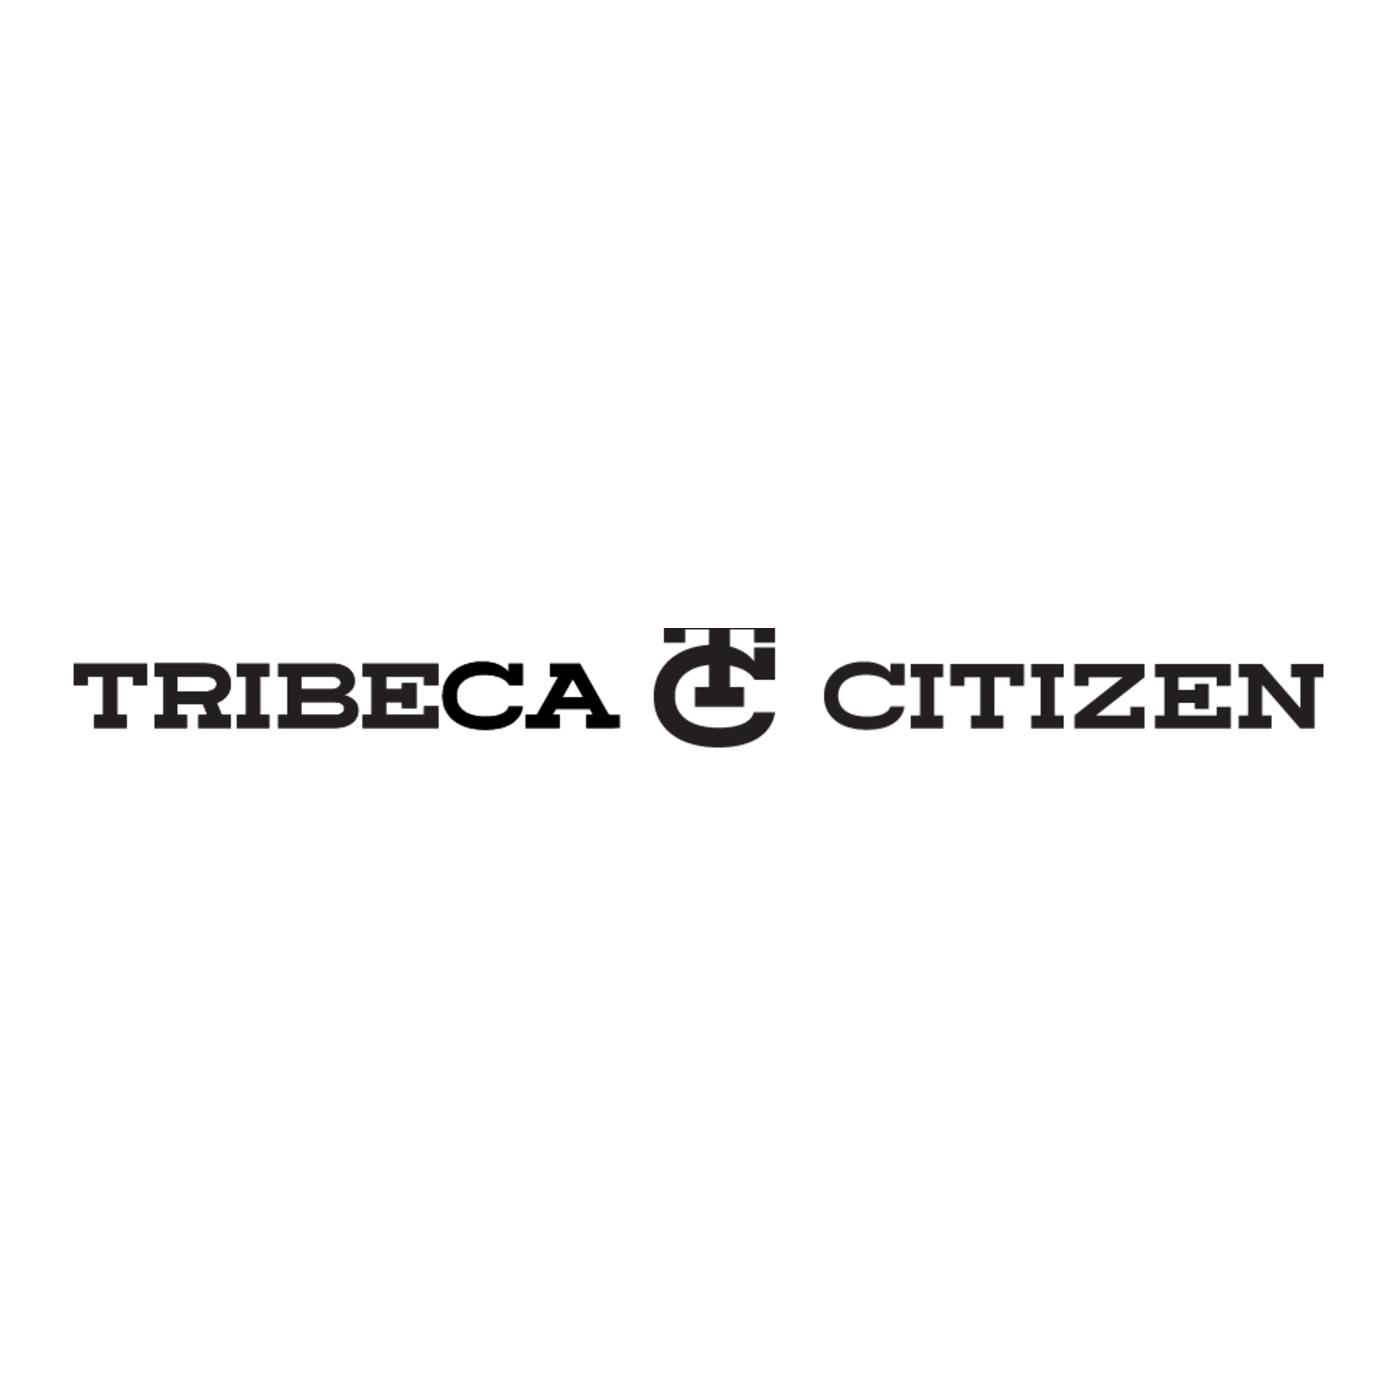 tc-logo-bottom-100 (1)  1400 1400.png